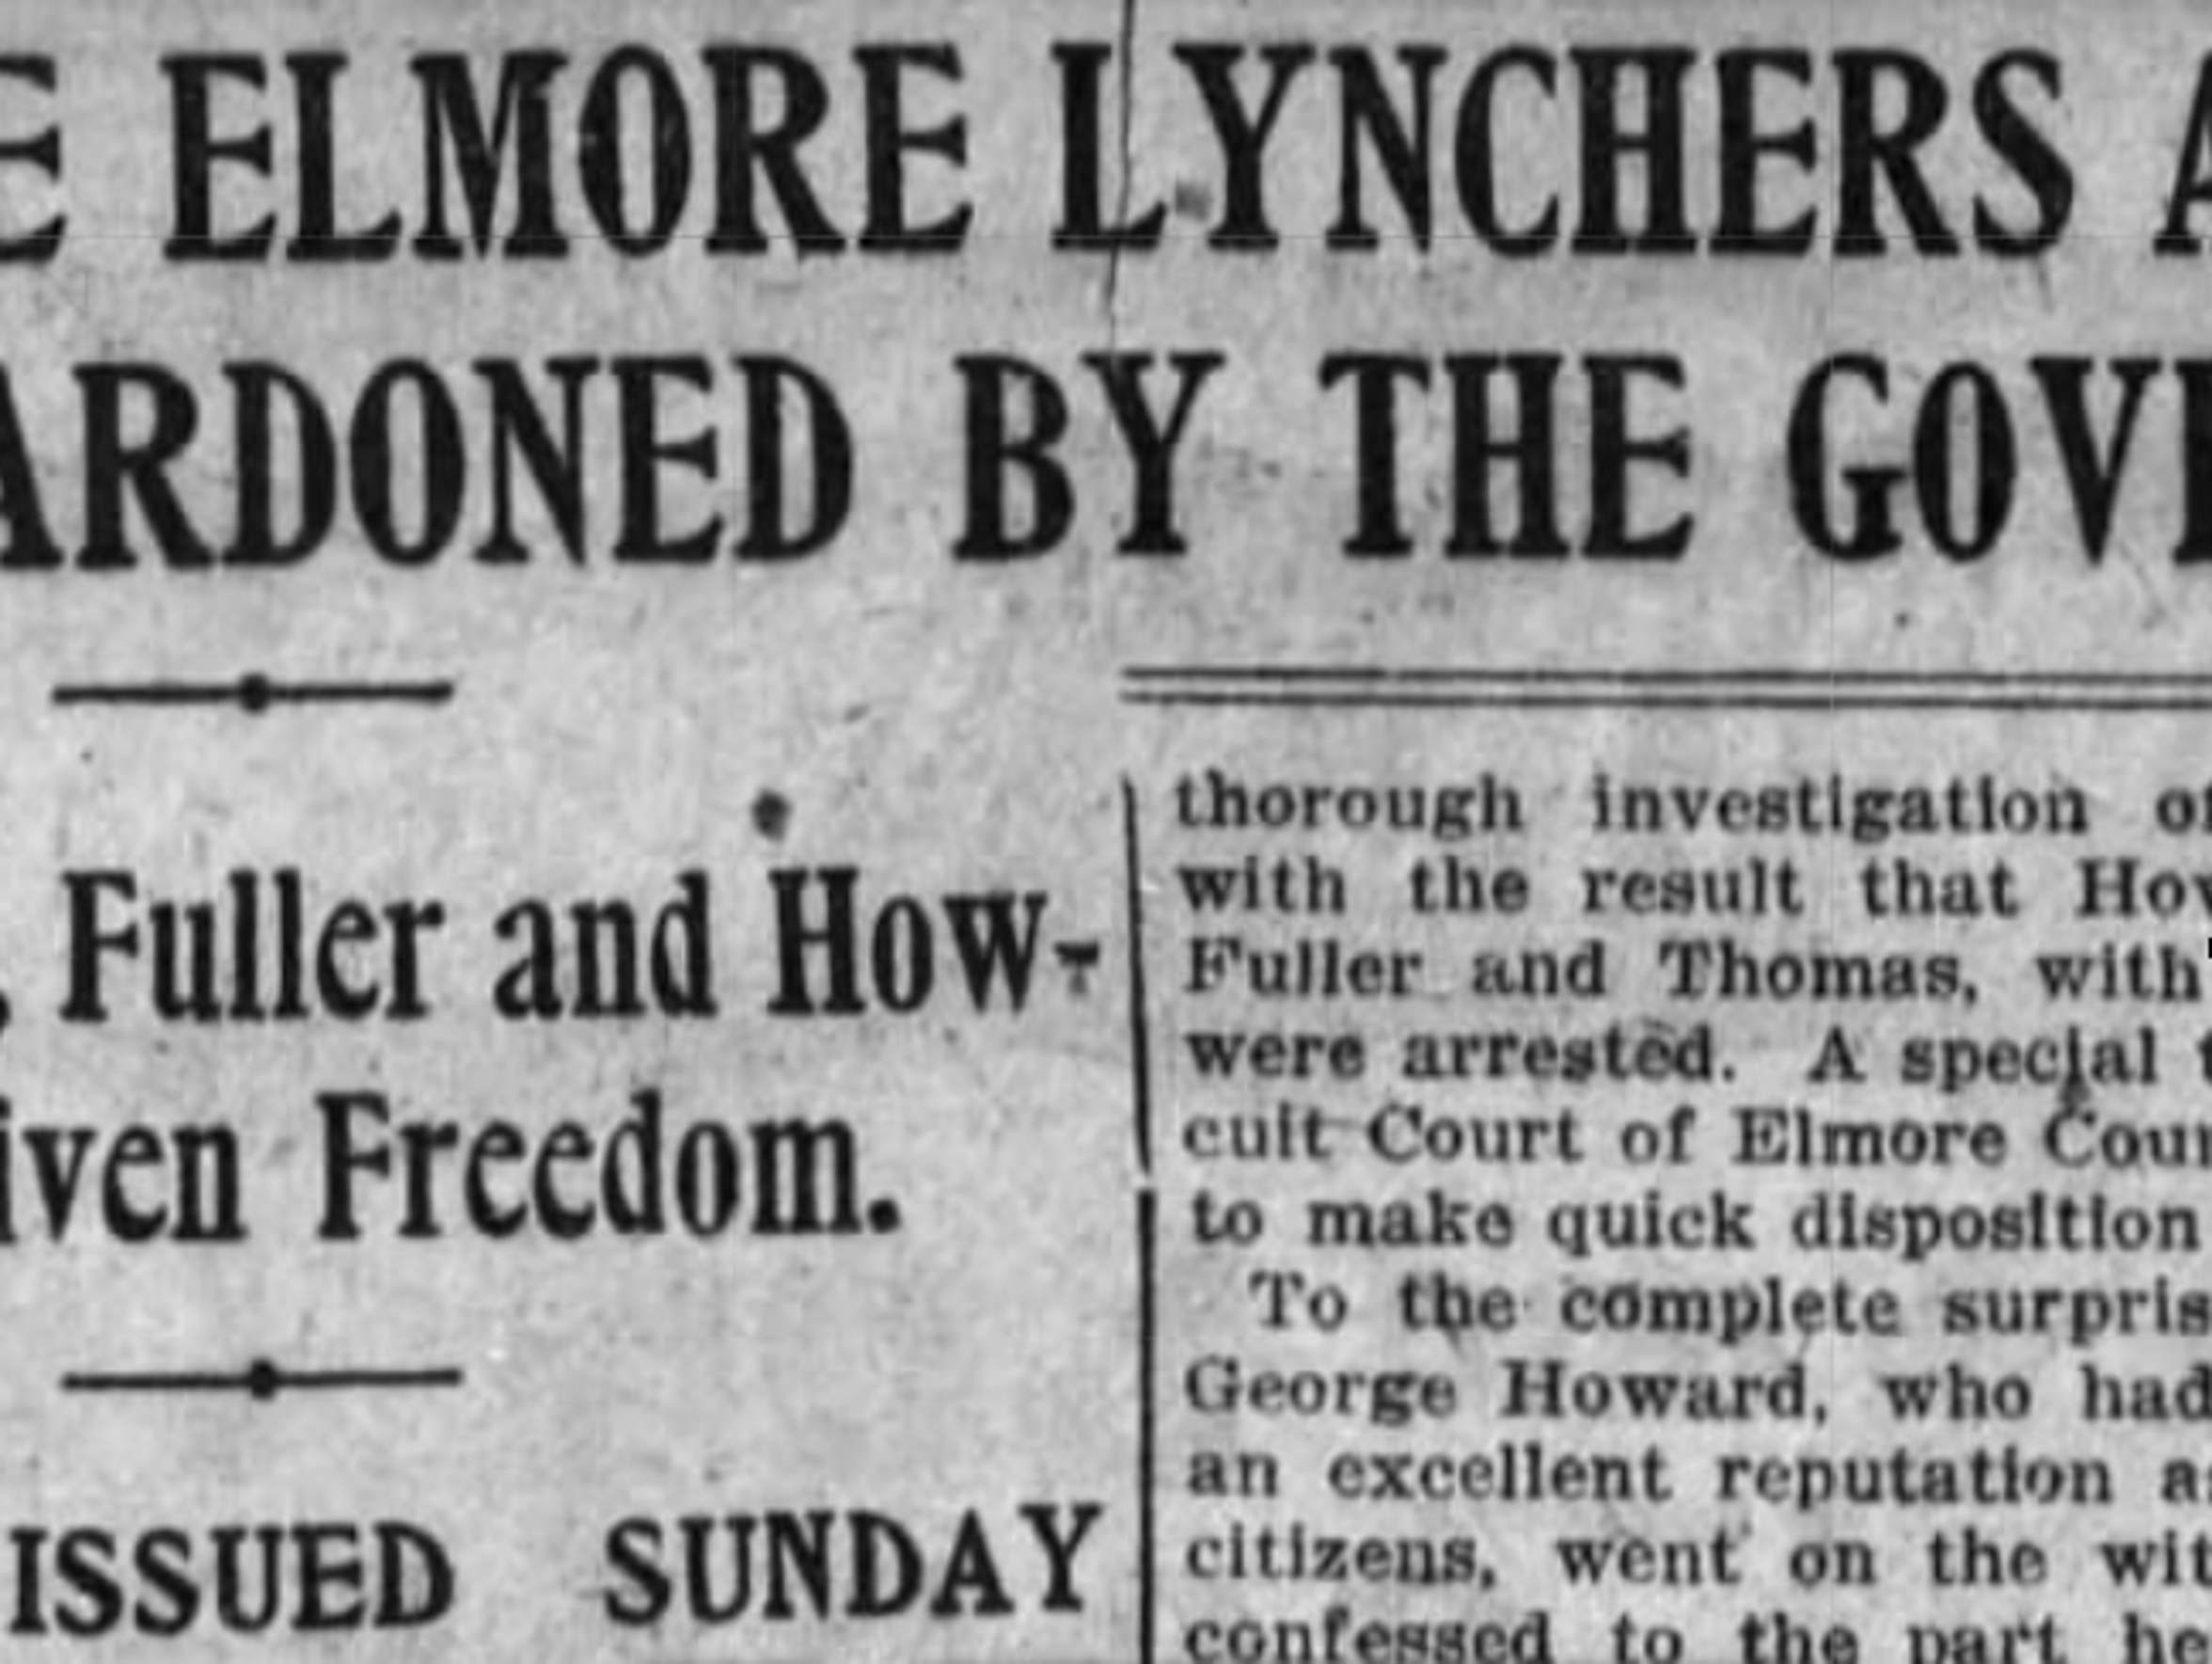 The Weekly Advertiser headline from June 13, 1902,